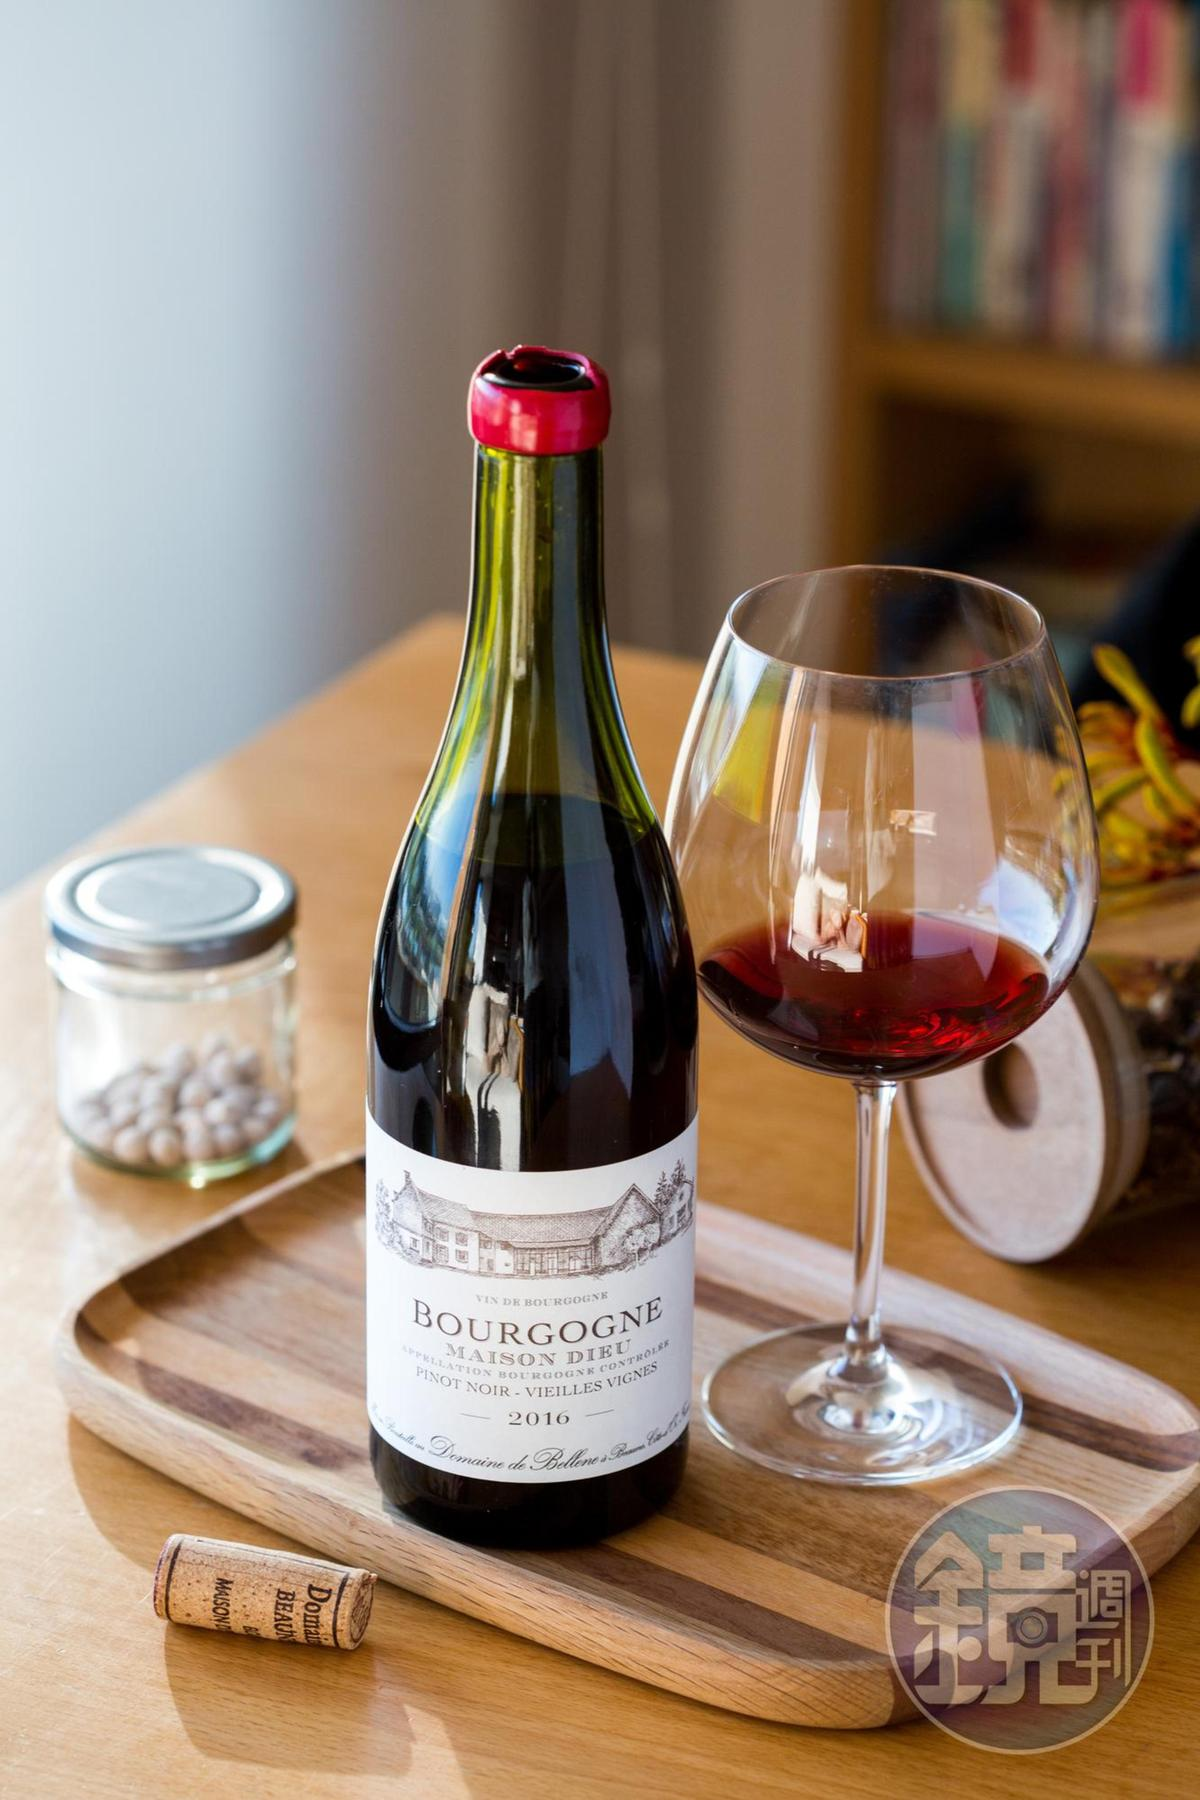 單寧平衡的「Domaine de Bellene, Bourgogne Rouge, Maison Dieu, 2016」,純飲佐餐都適宜。(創潮酒坊, 650元/瓶)